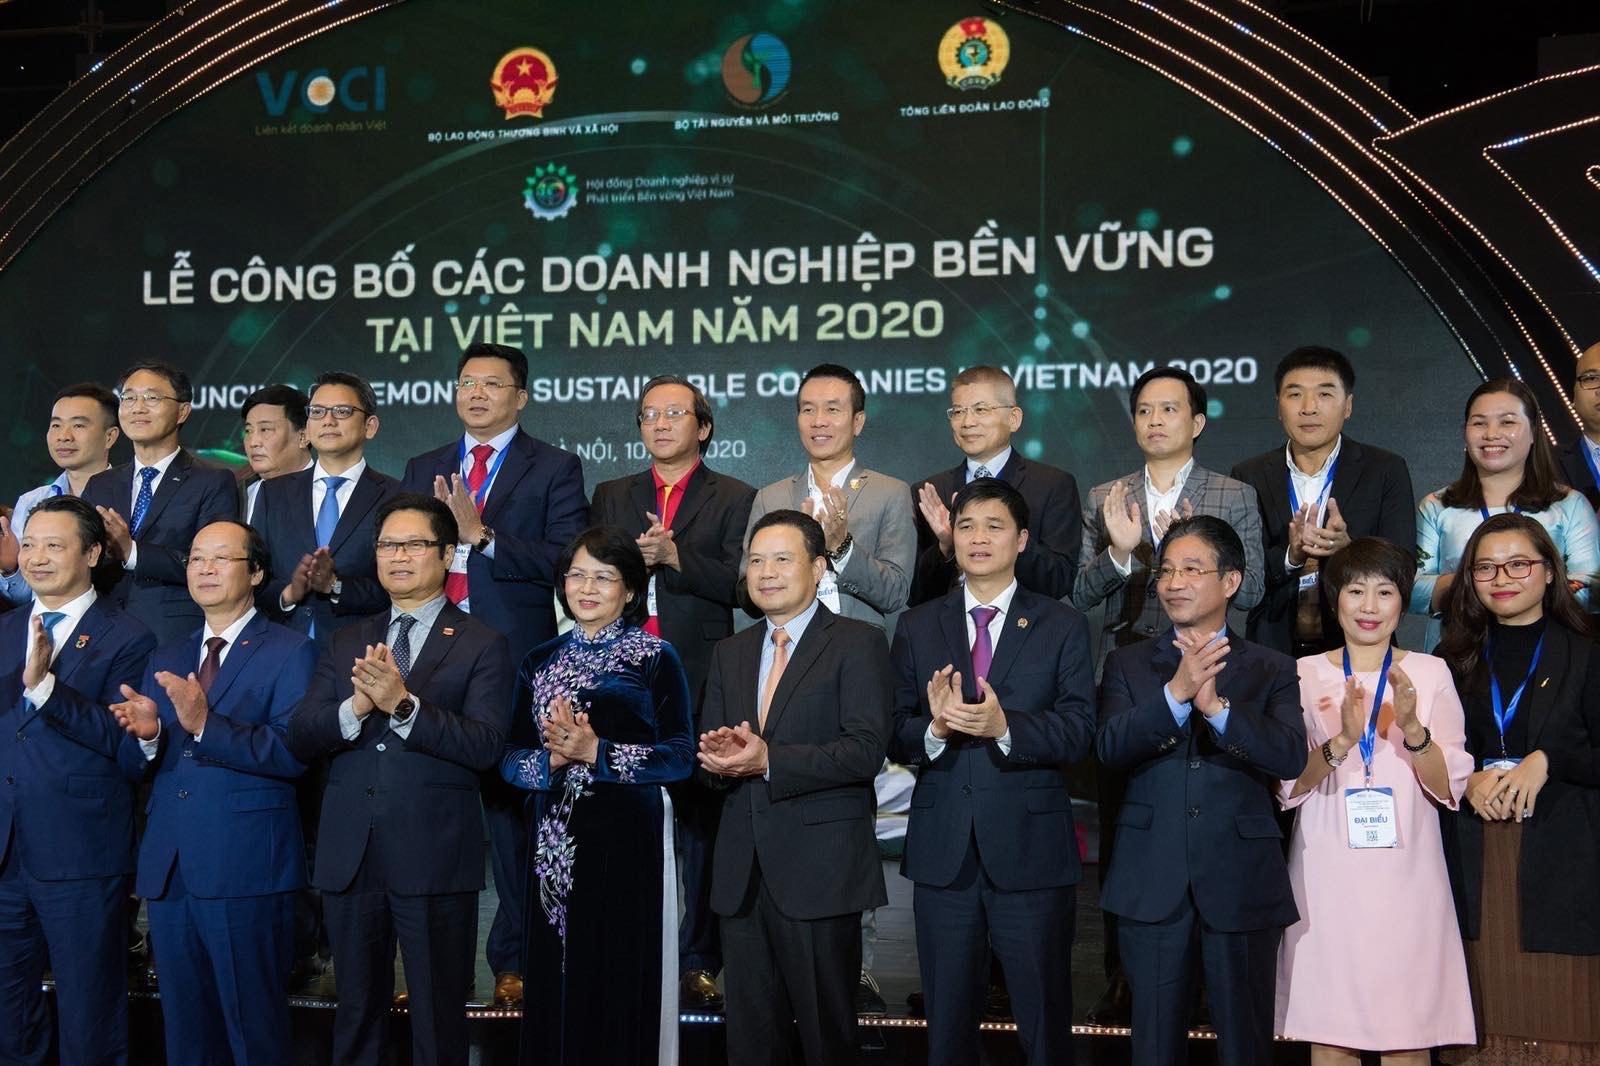 Anheuser-Busch InBev Vietnam honoured as Top 100 Sustainability Companies 2020